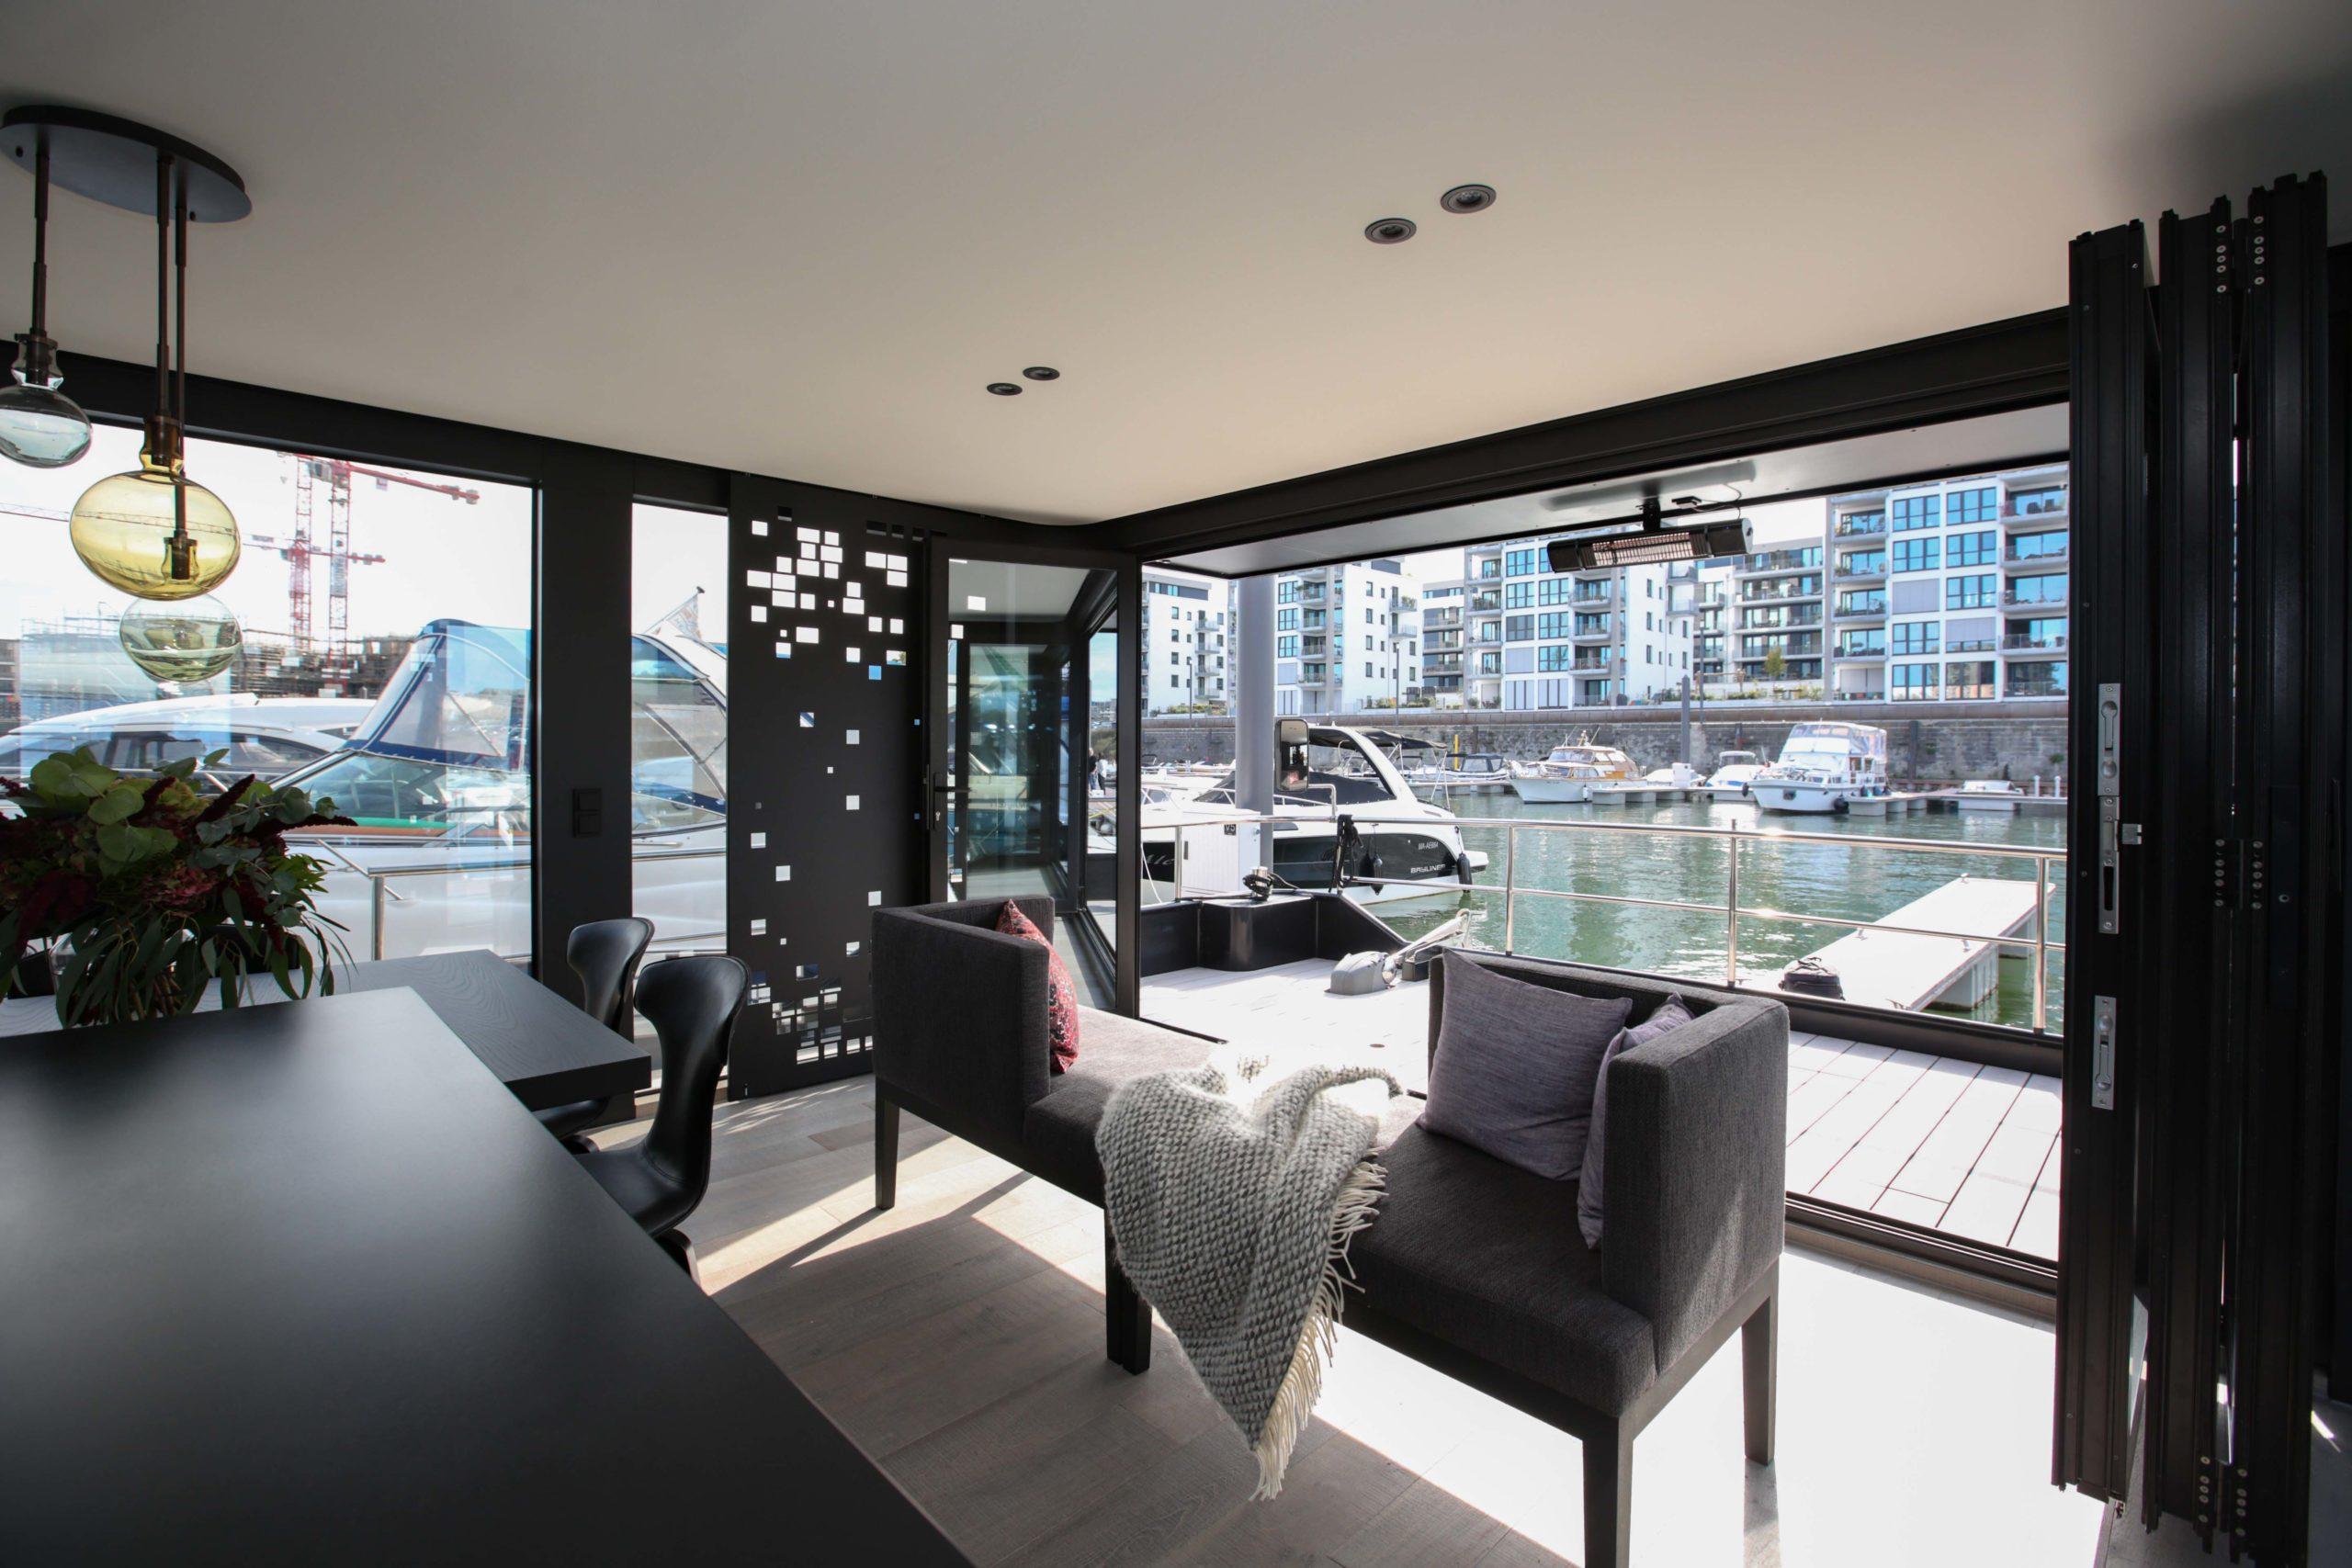 Innendesign Hausboot Onyx Cruising Home Nobla Kalrsuhe